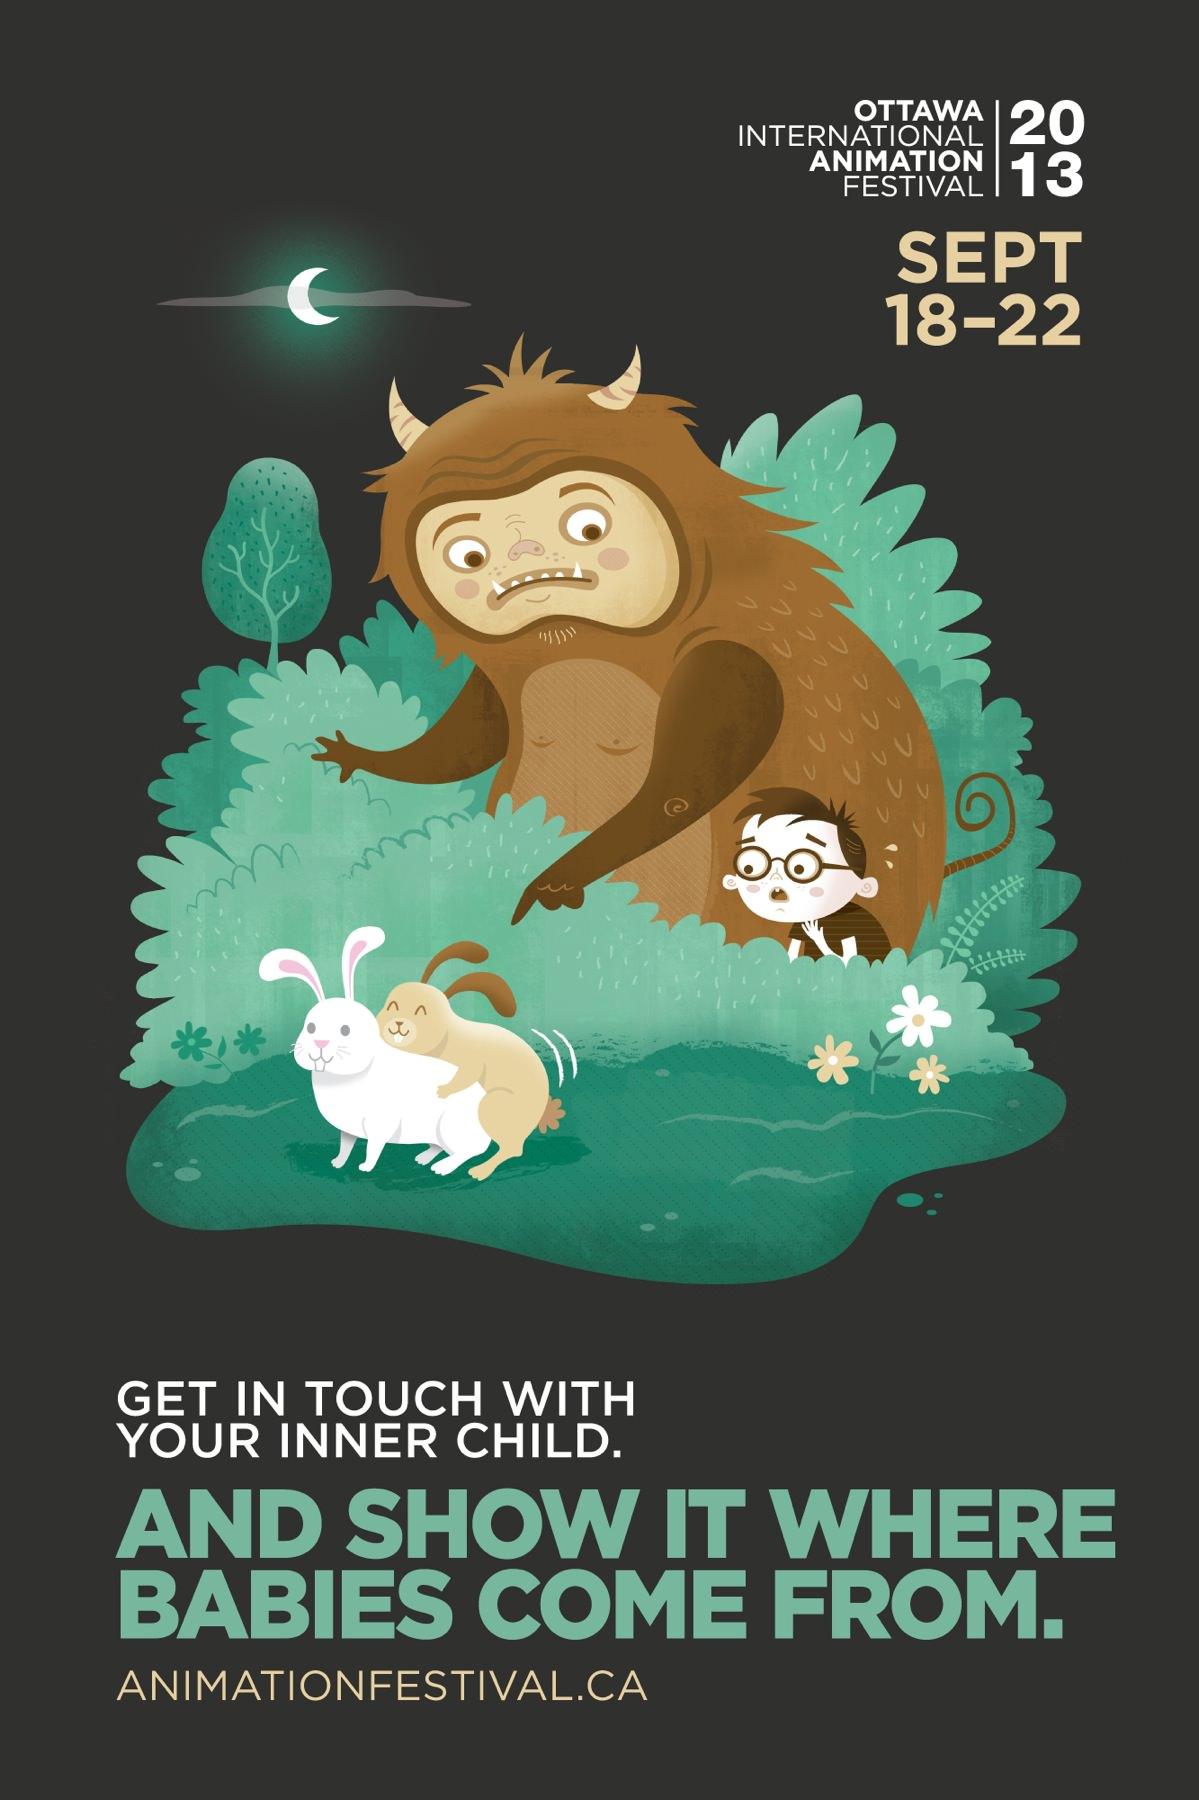 Poster design best - 01_poster_wherebabiescomefrom_vfnl_aotw